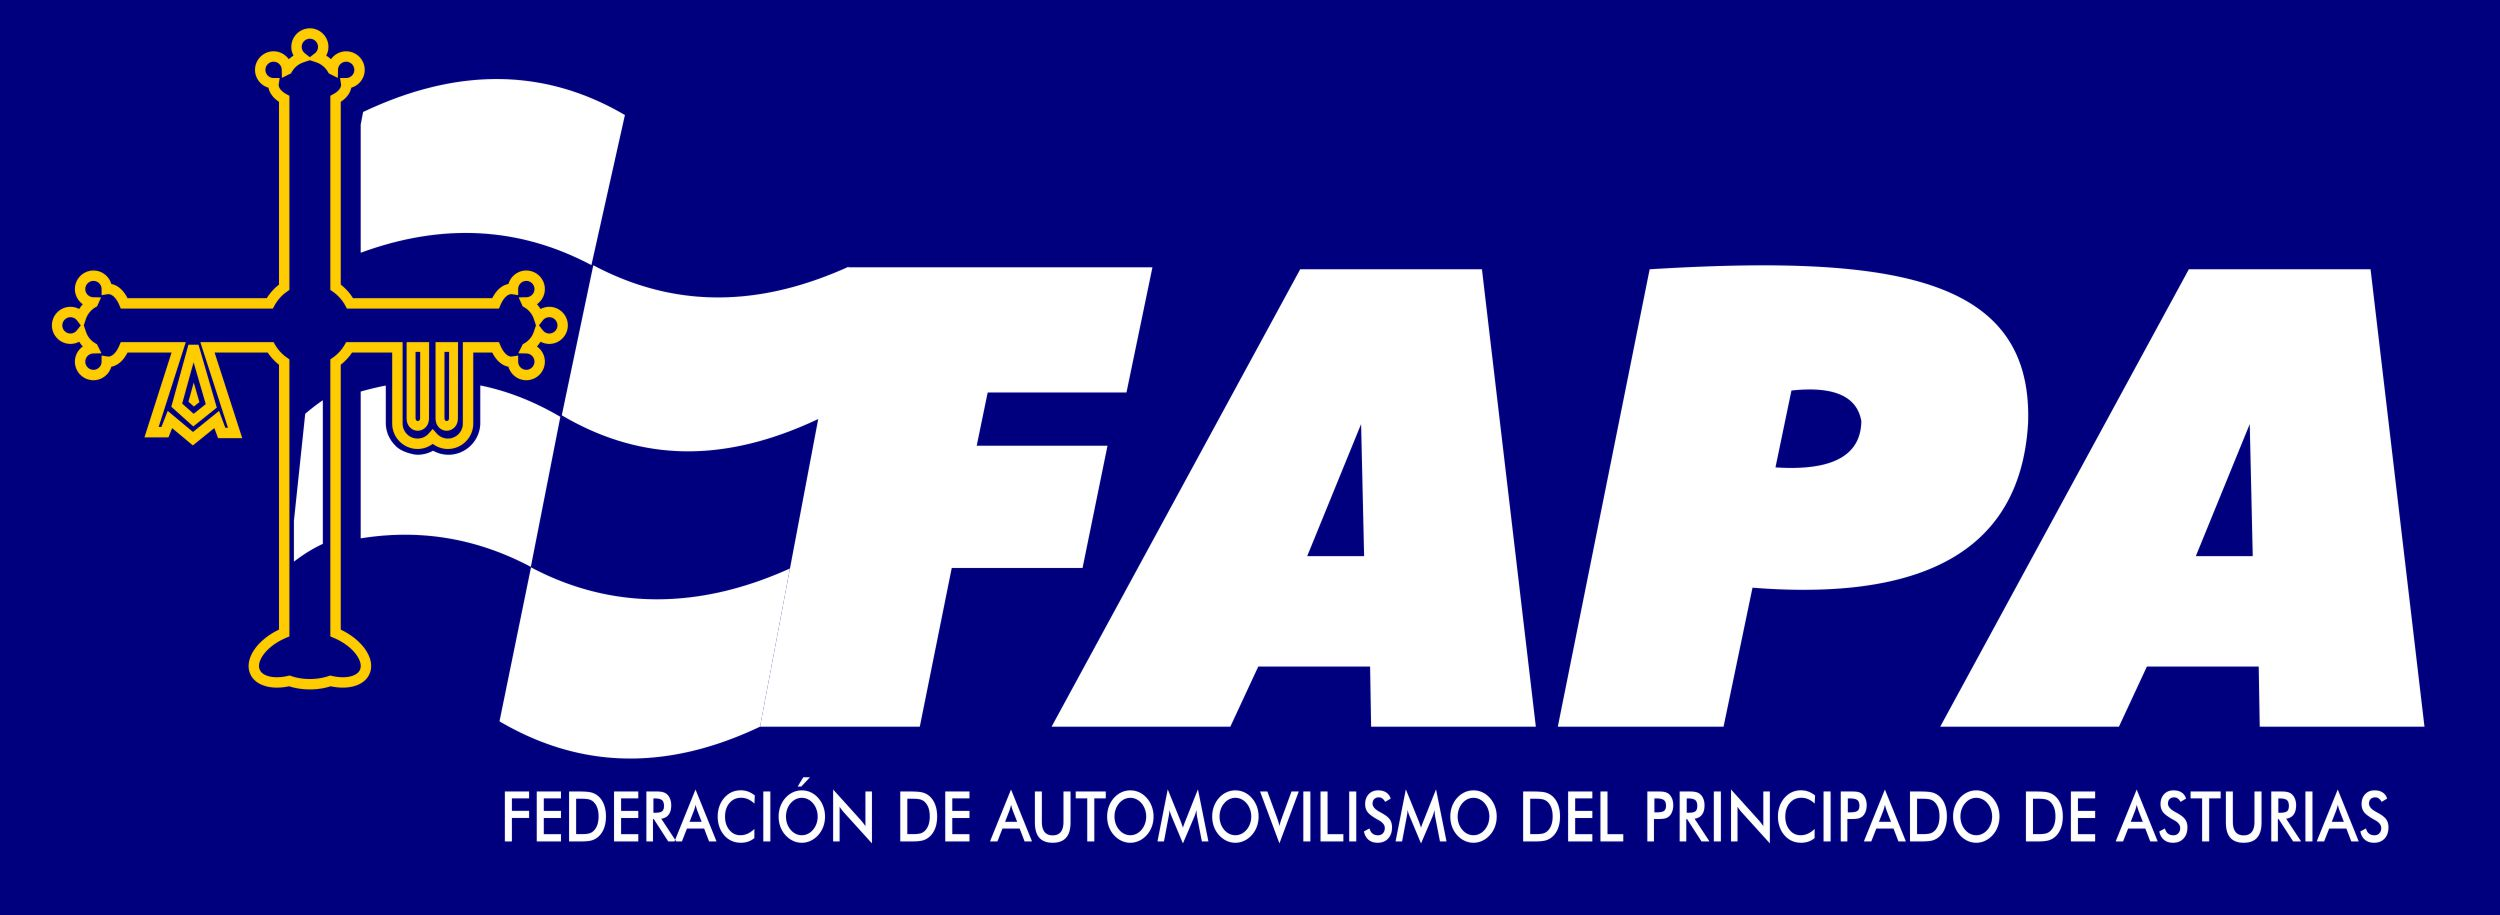 logotipo-fapa-fondo-azul